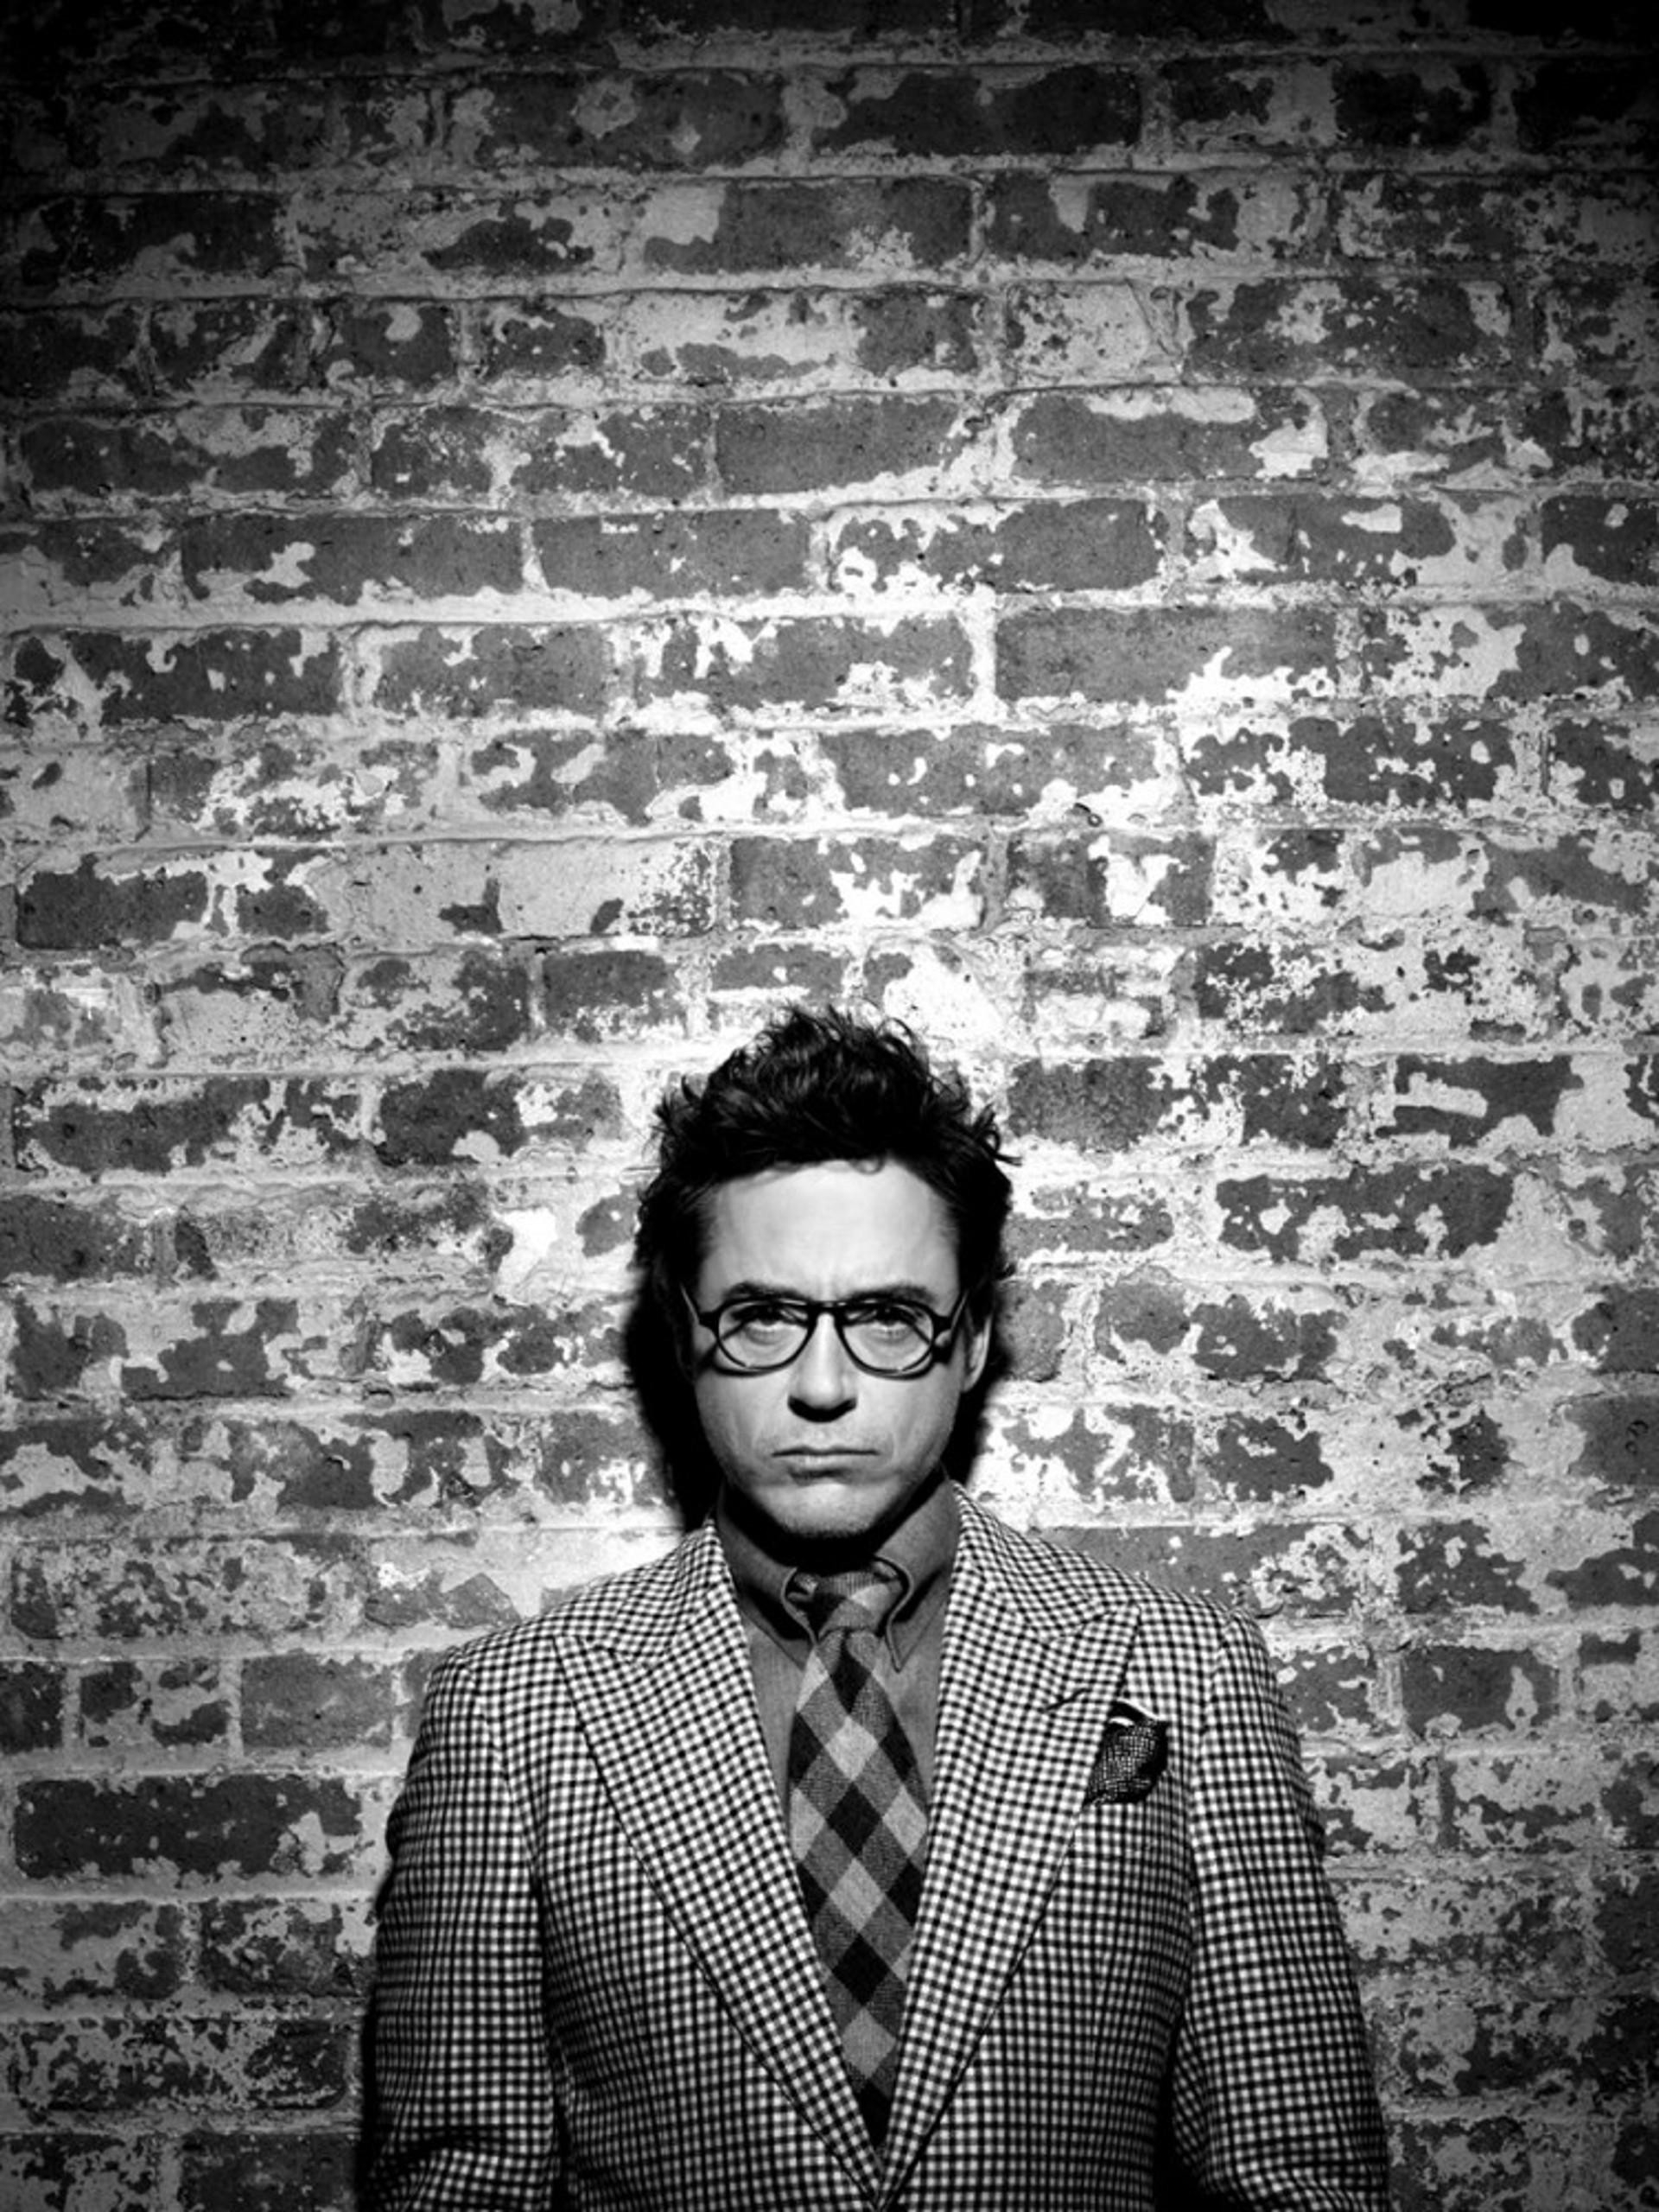 10003 Robert Downey Jr. Brick Wall BW by Timothy White